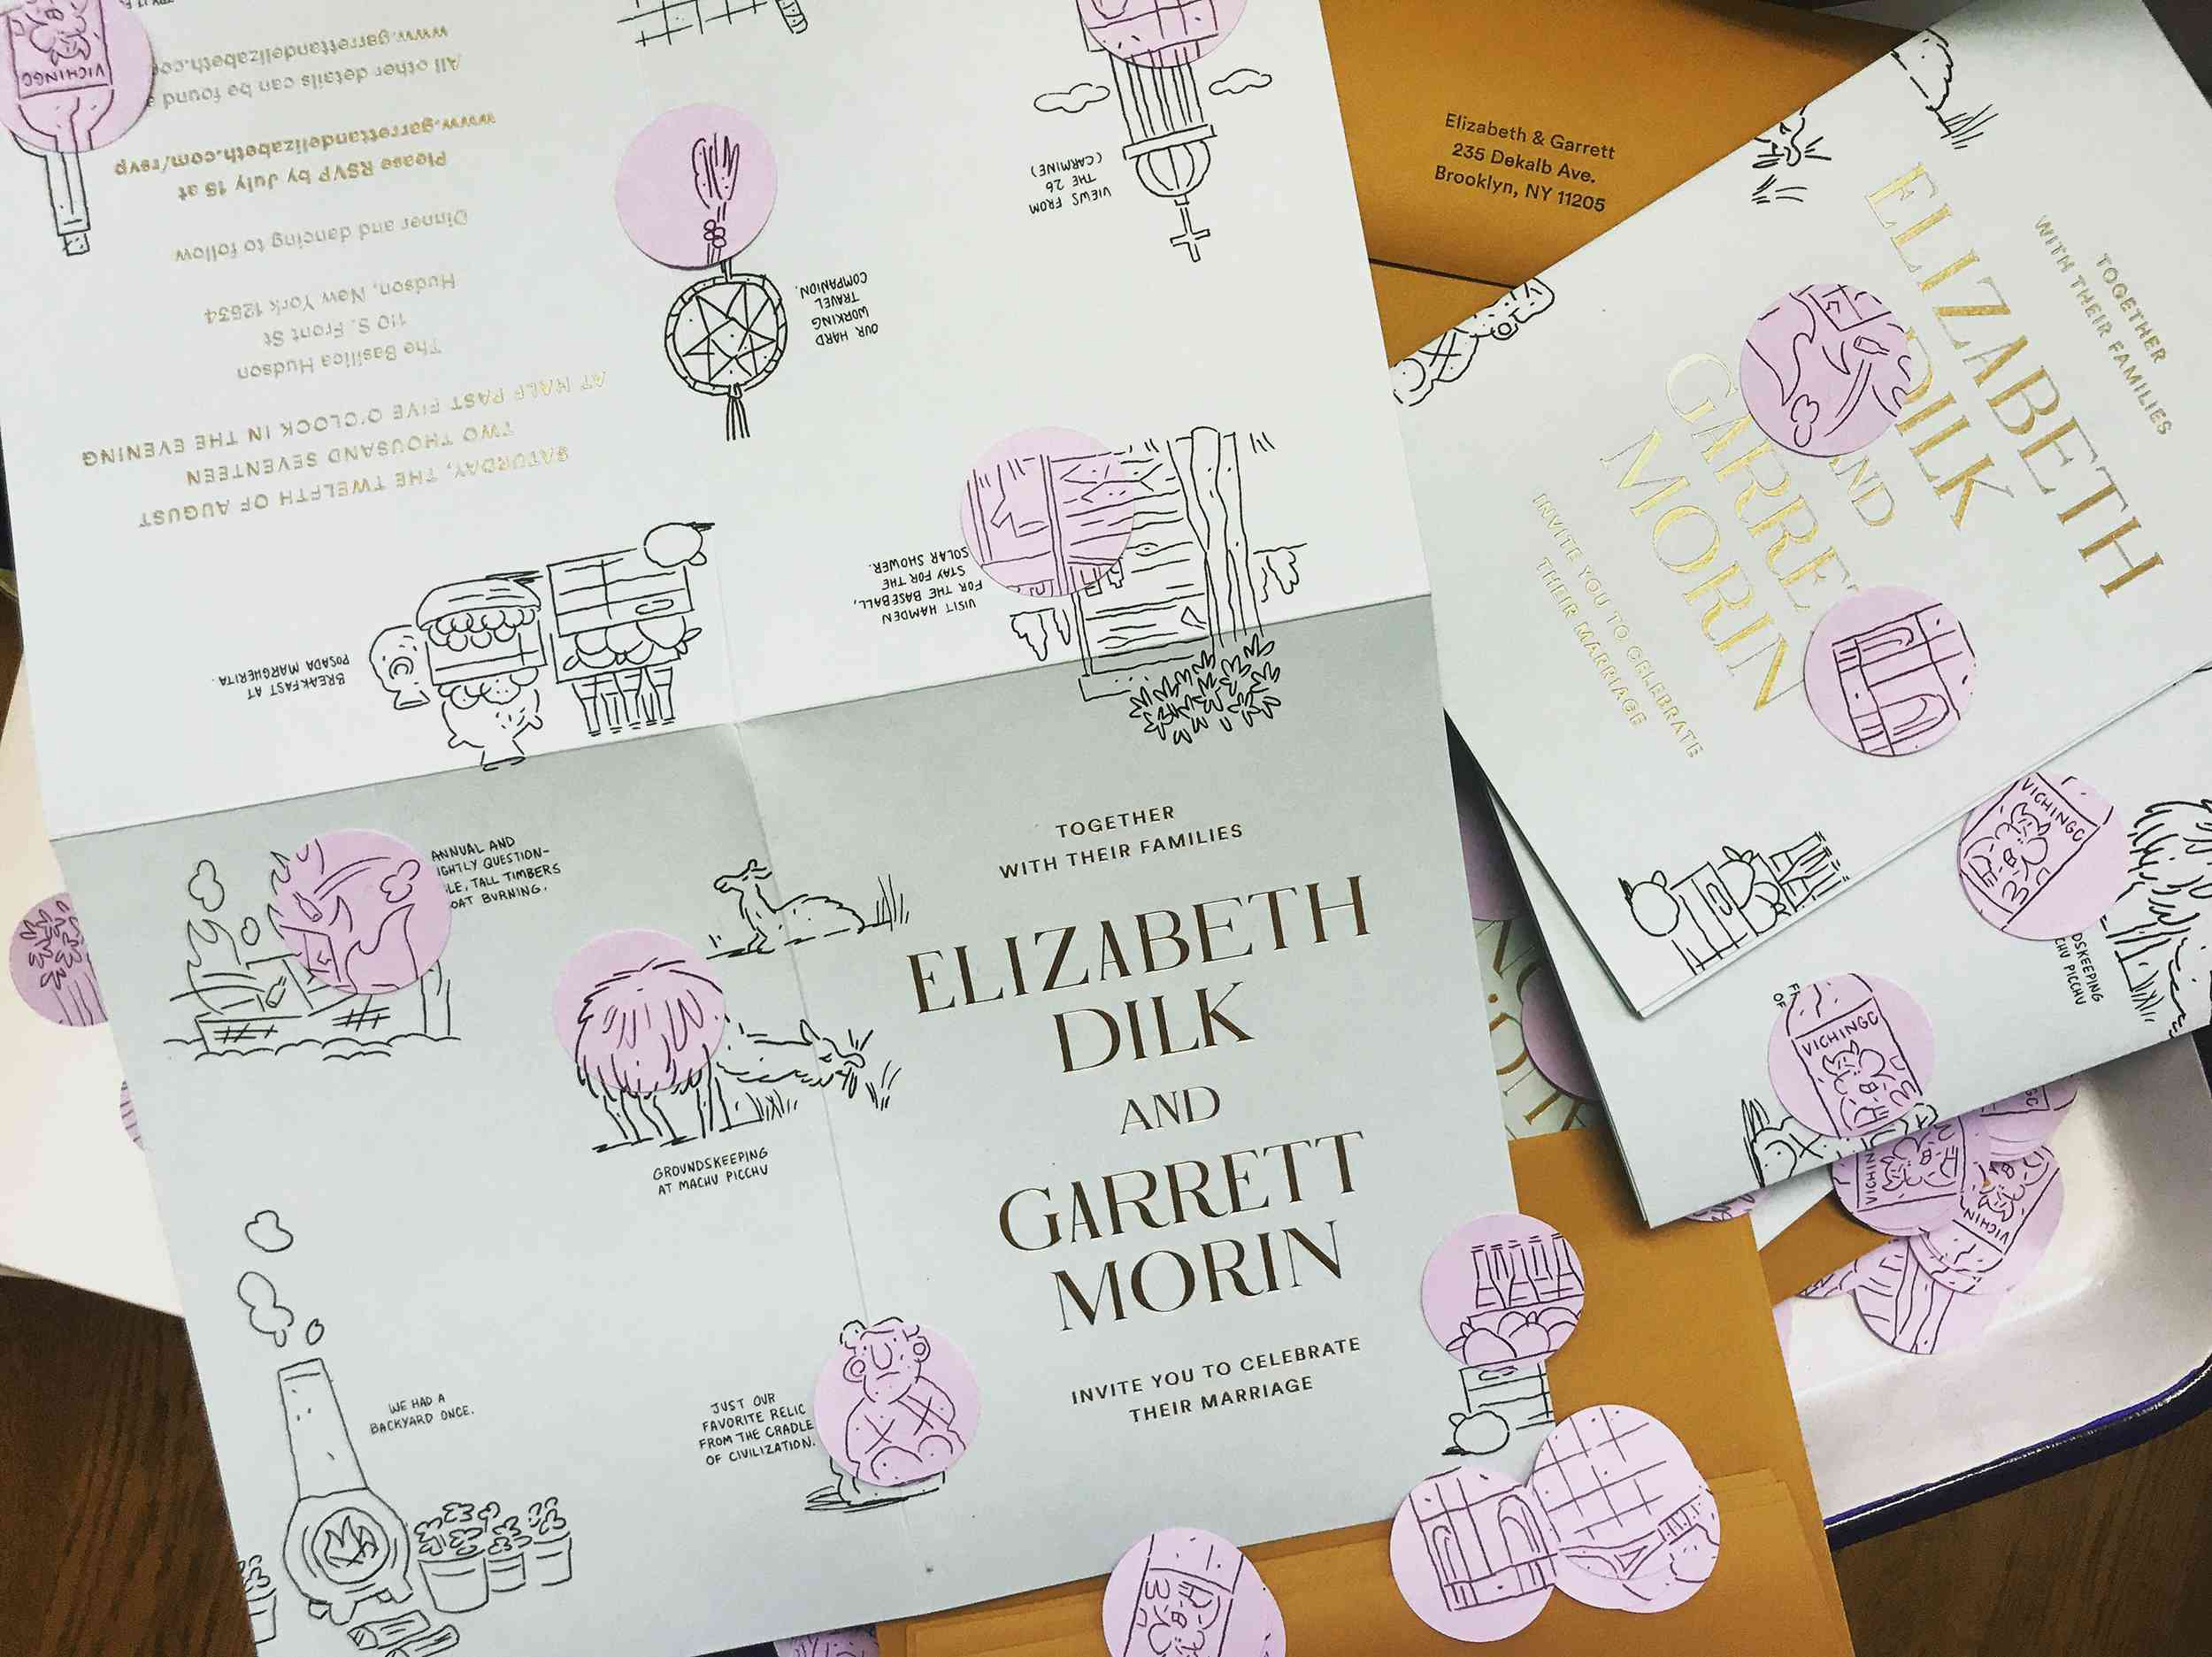 <p>invitations with illustrations and confetti</p><br><br>